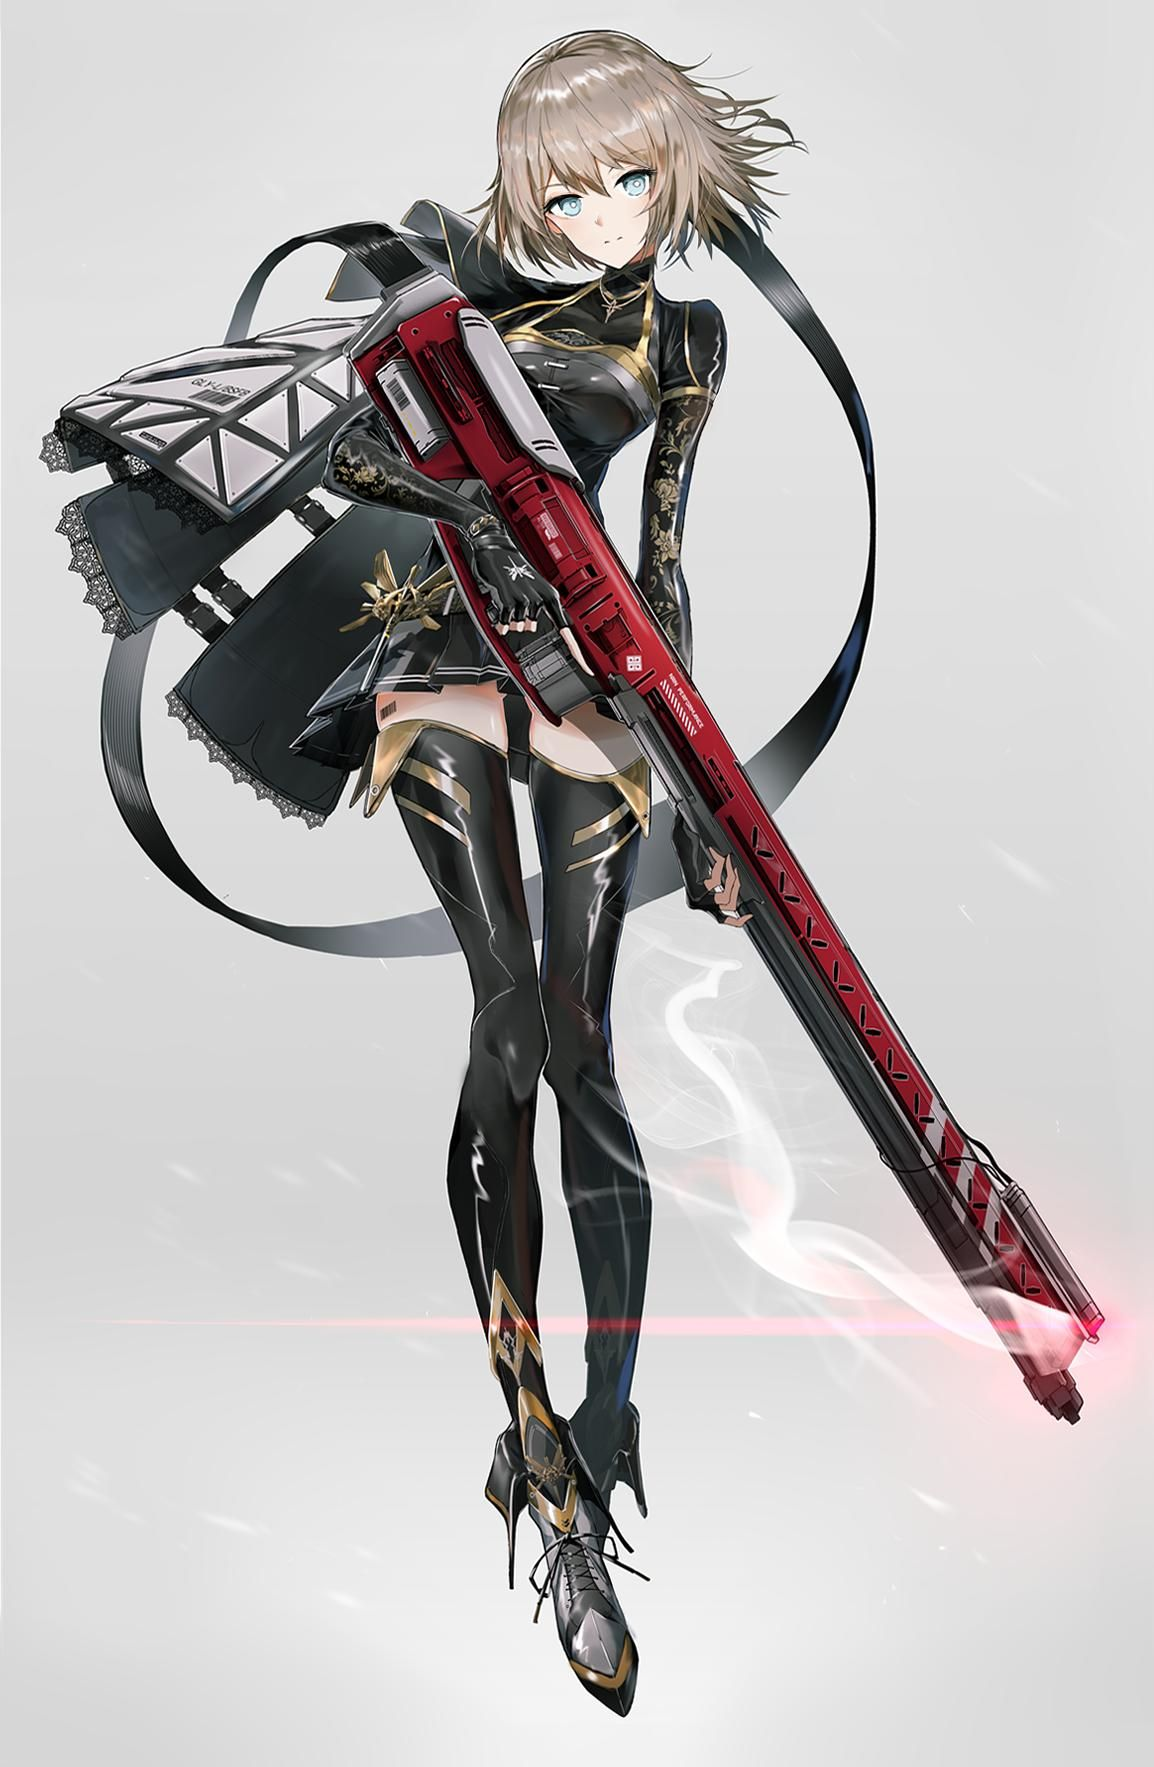 Sniper railgun [Original] Gunime Anime military, Anime